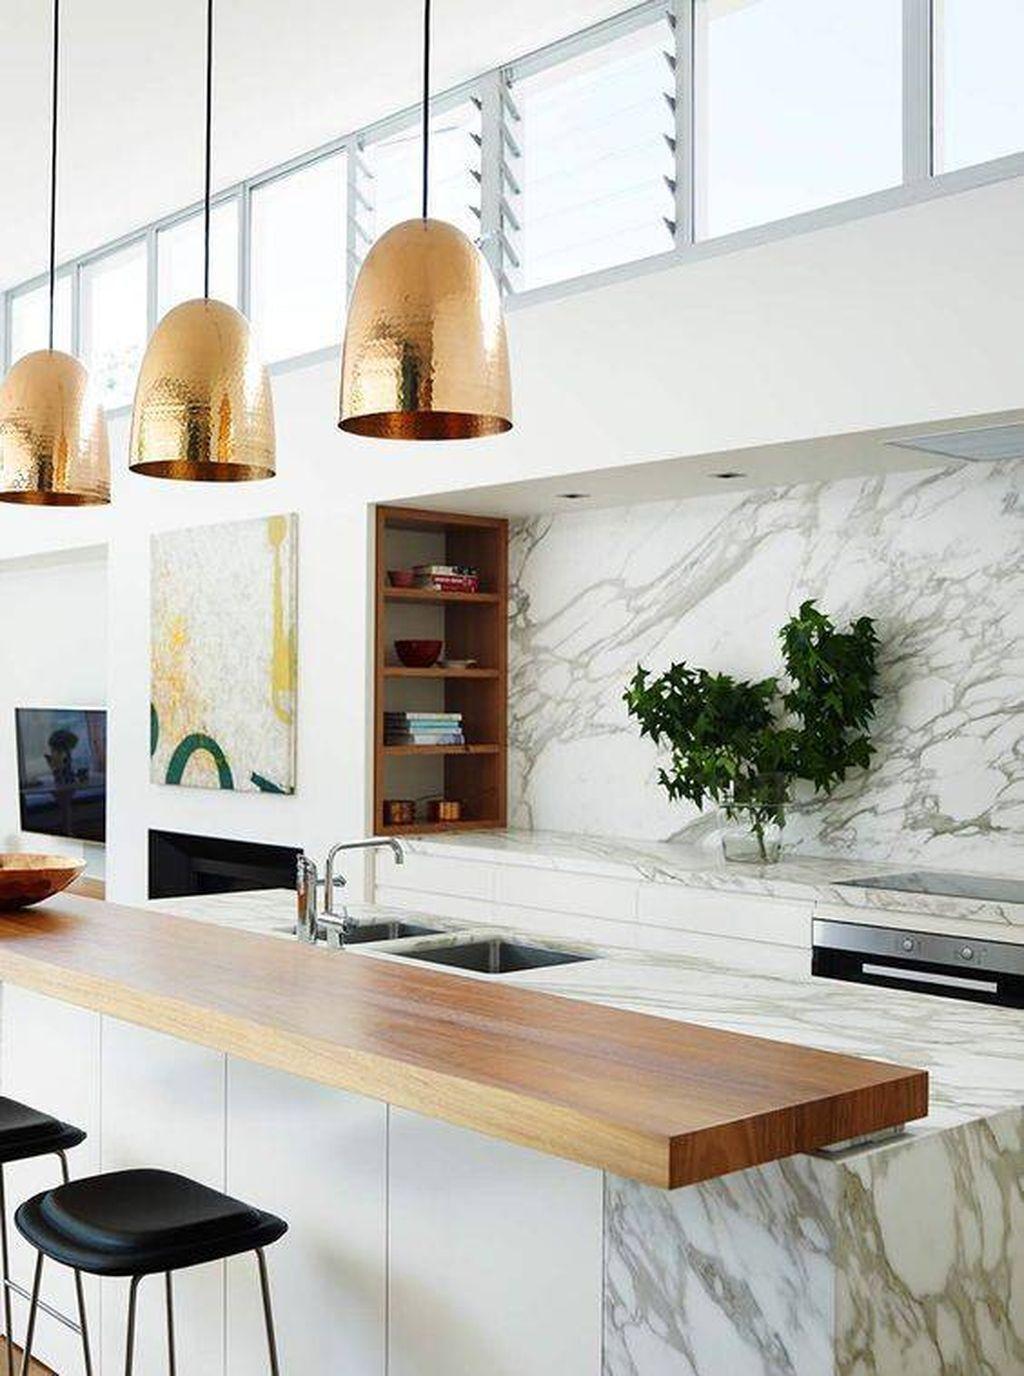 Trend alert add midcentury lamps to your kitchen décor kitchen